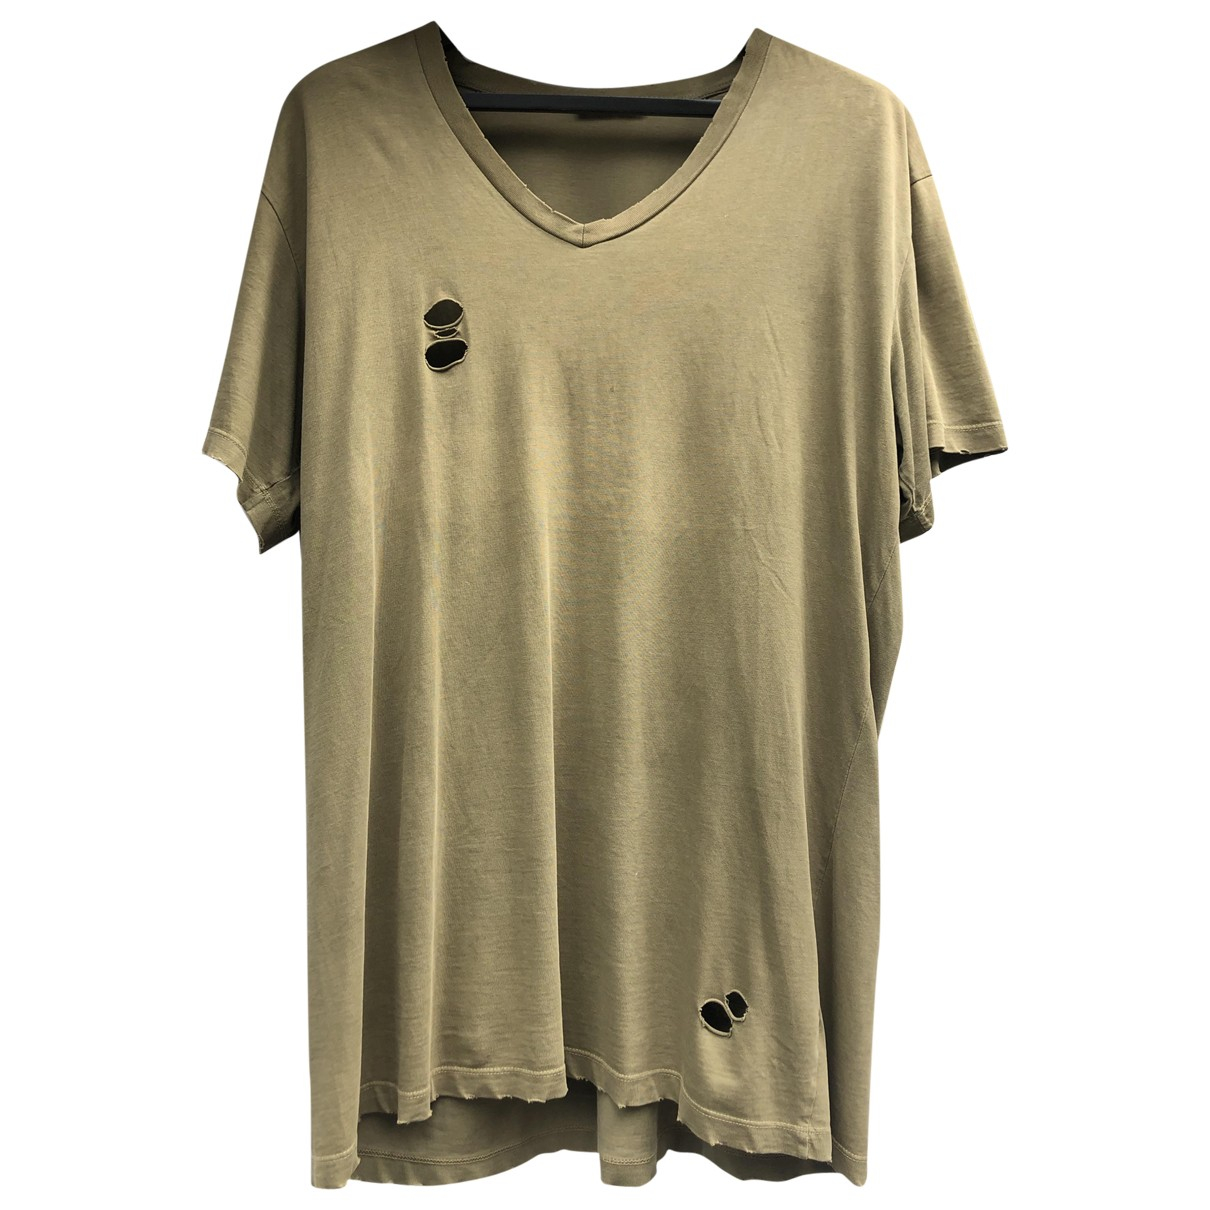 Balmain - Tee shirts   pour homme en coton - kaki